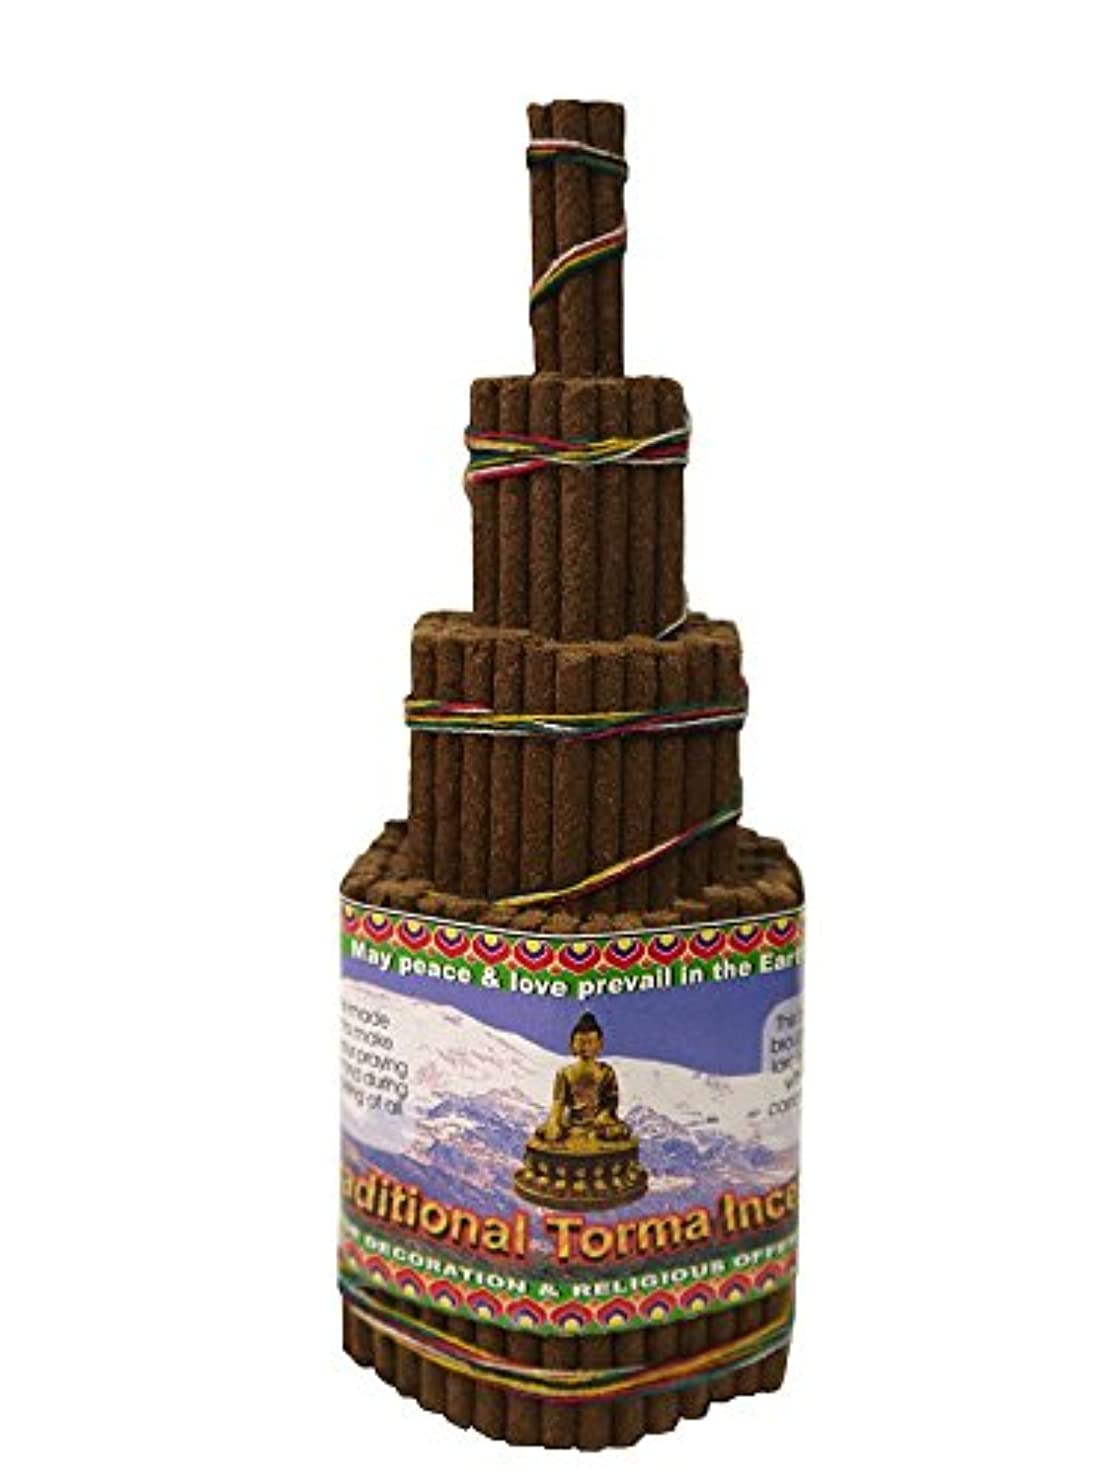 NEPAL INCENSE 【TraditionaTormaIncenseトラディショナルトルマ】